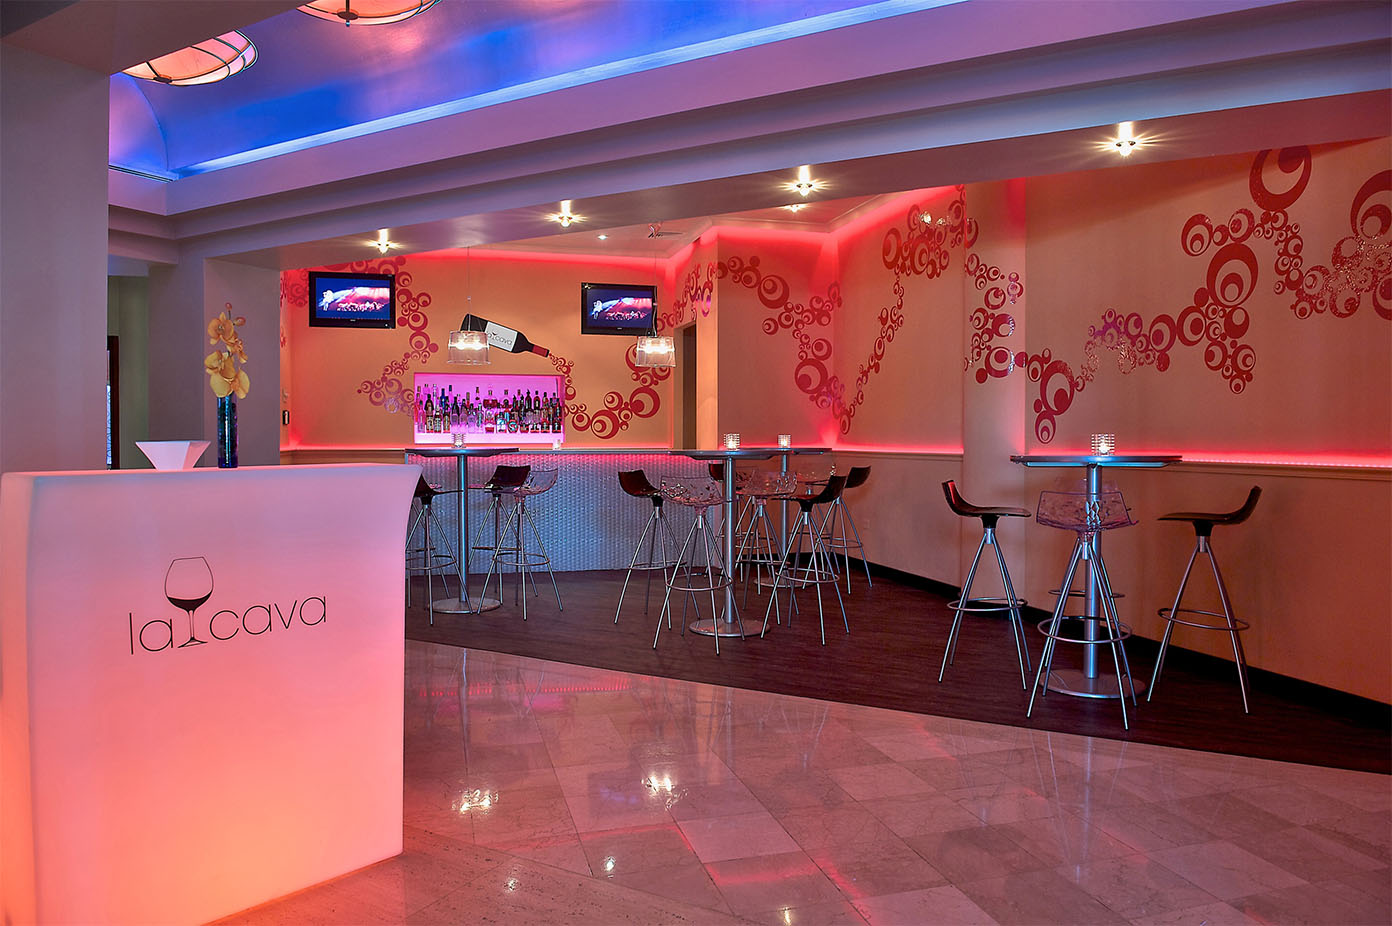 La Cava at Hilton Ponce